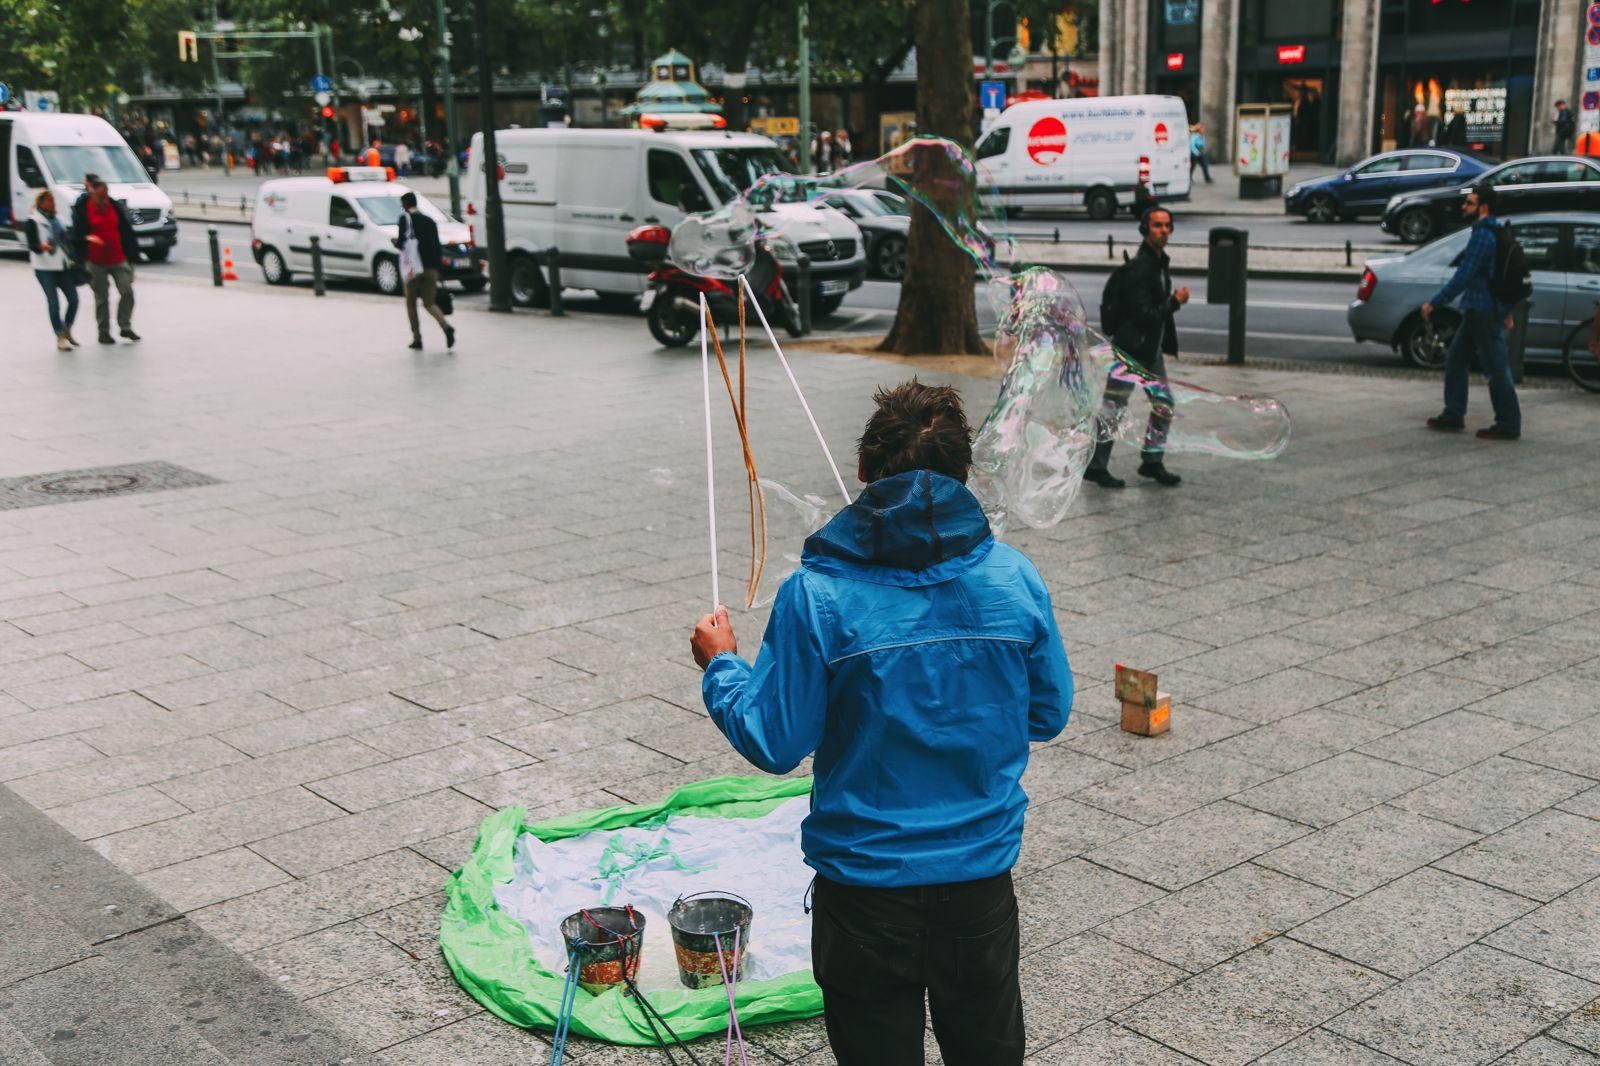 Sightseeing In Berlin, Germany - Part 1 (22)